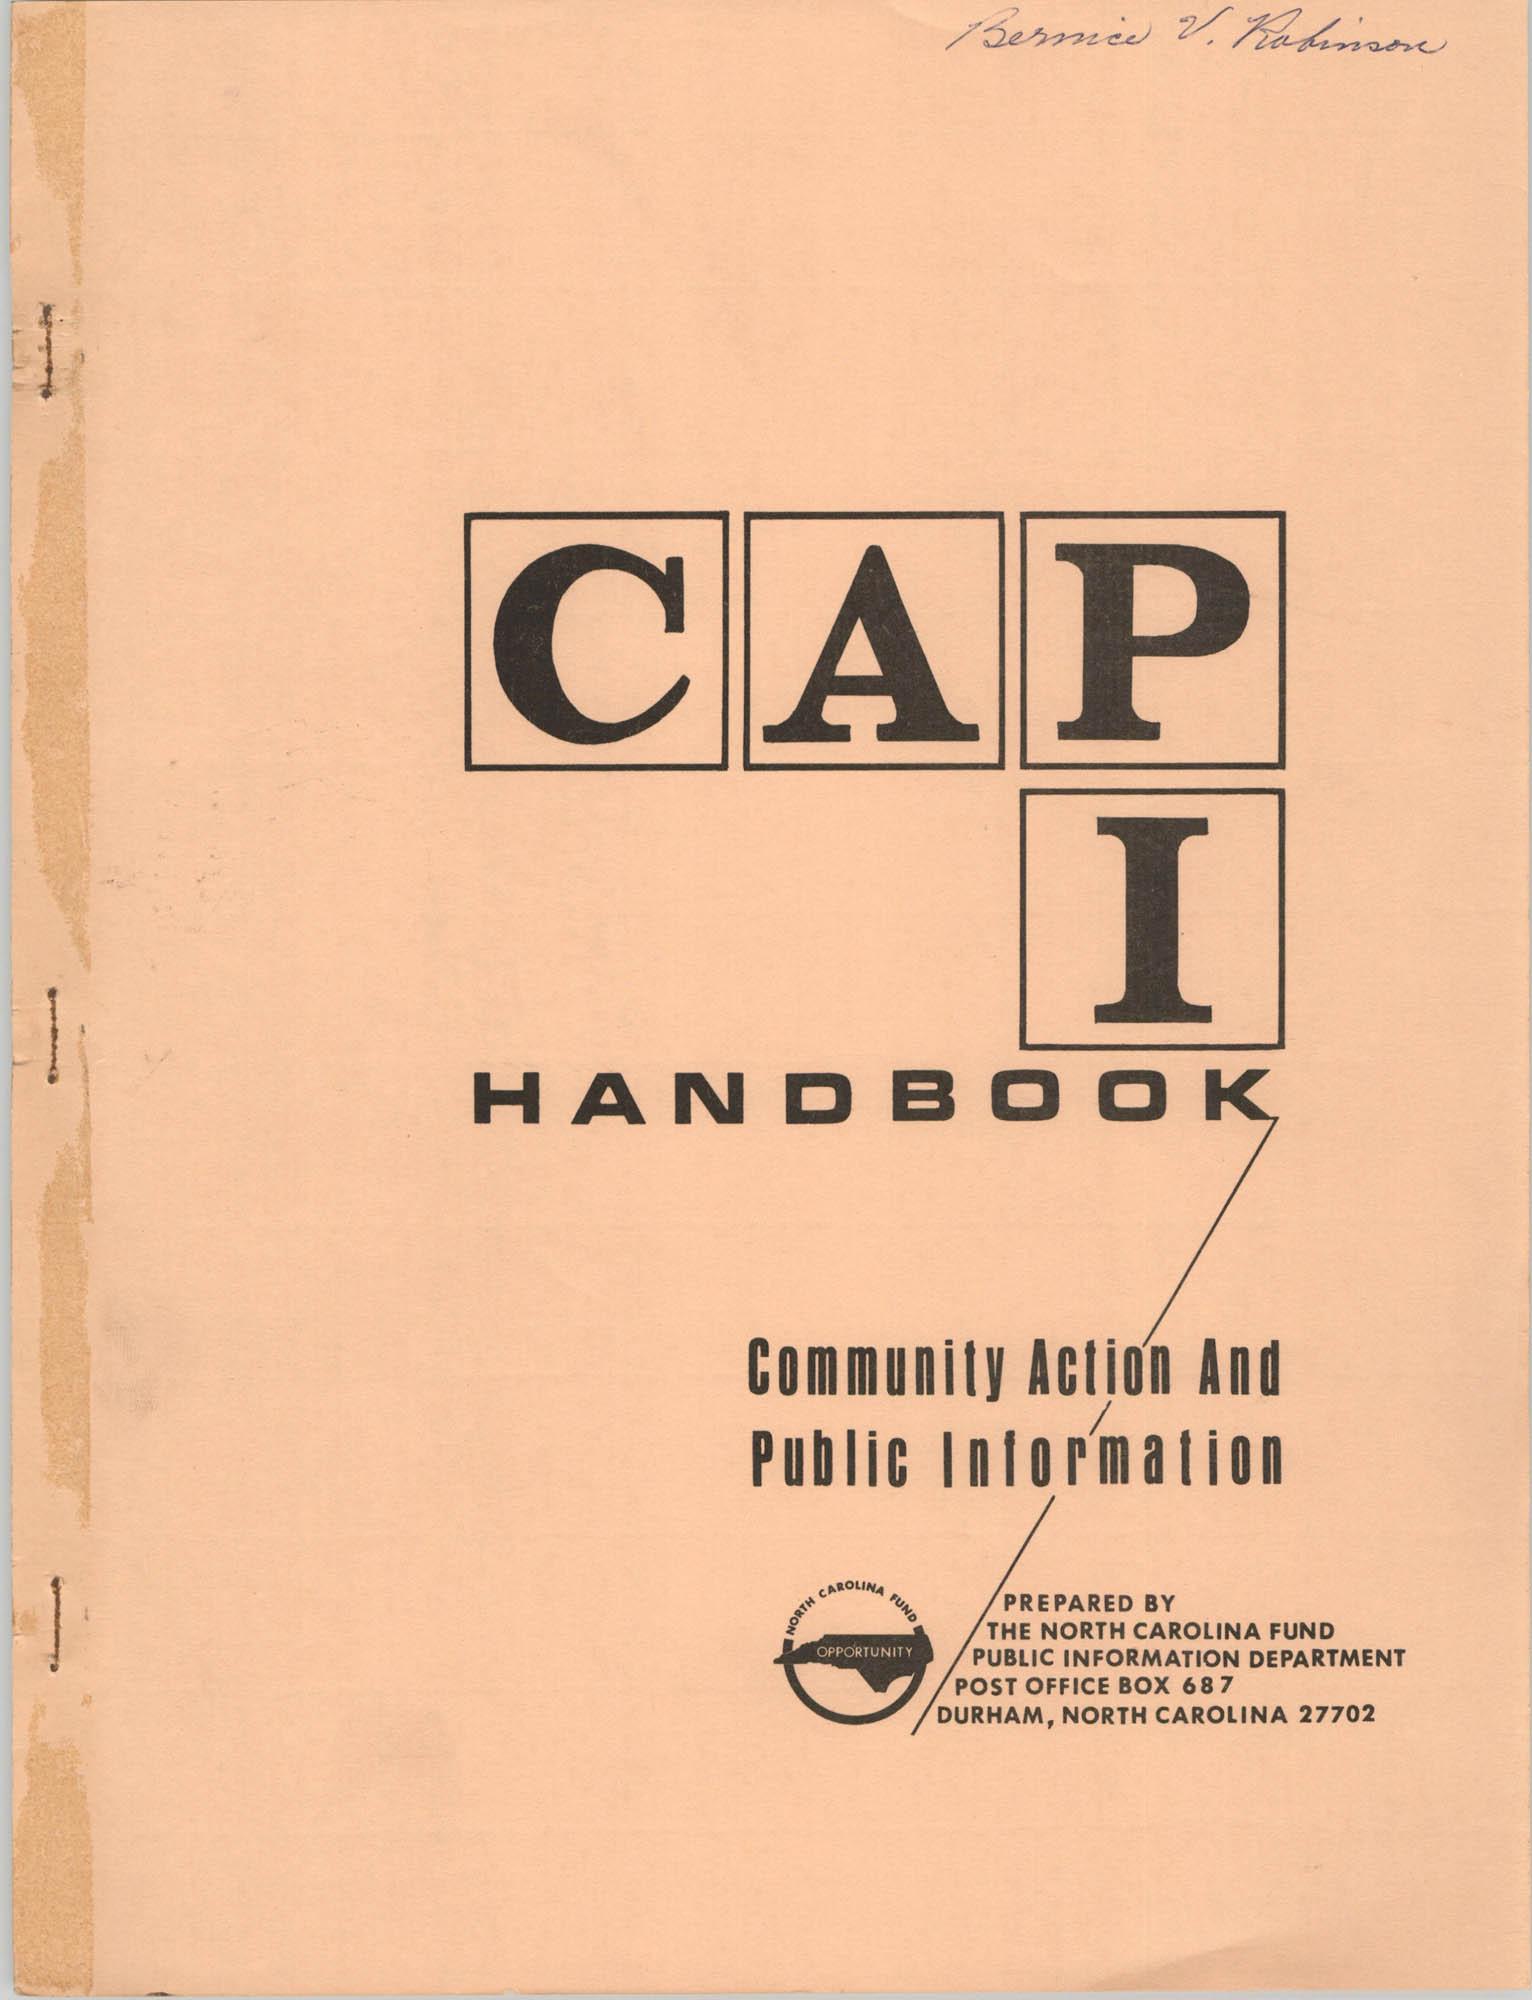 Community Action and Public Information Handbook